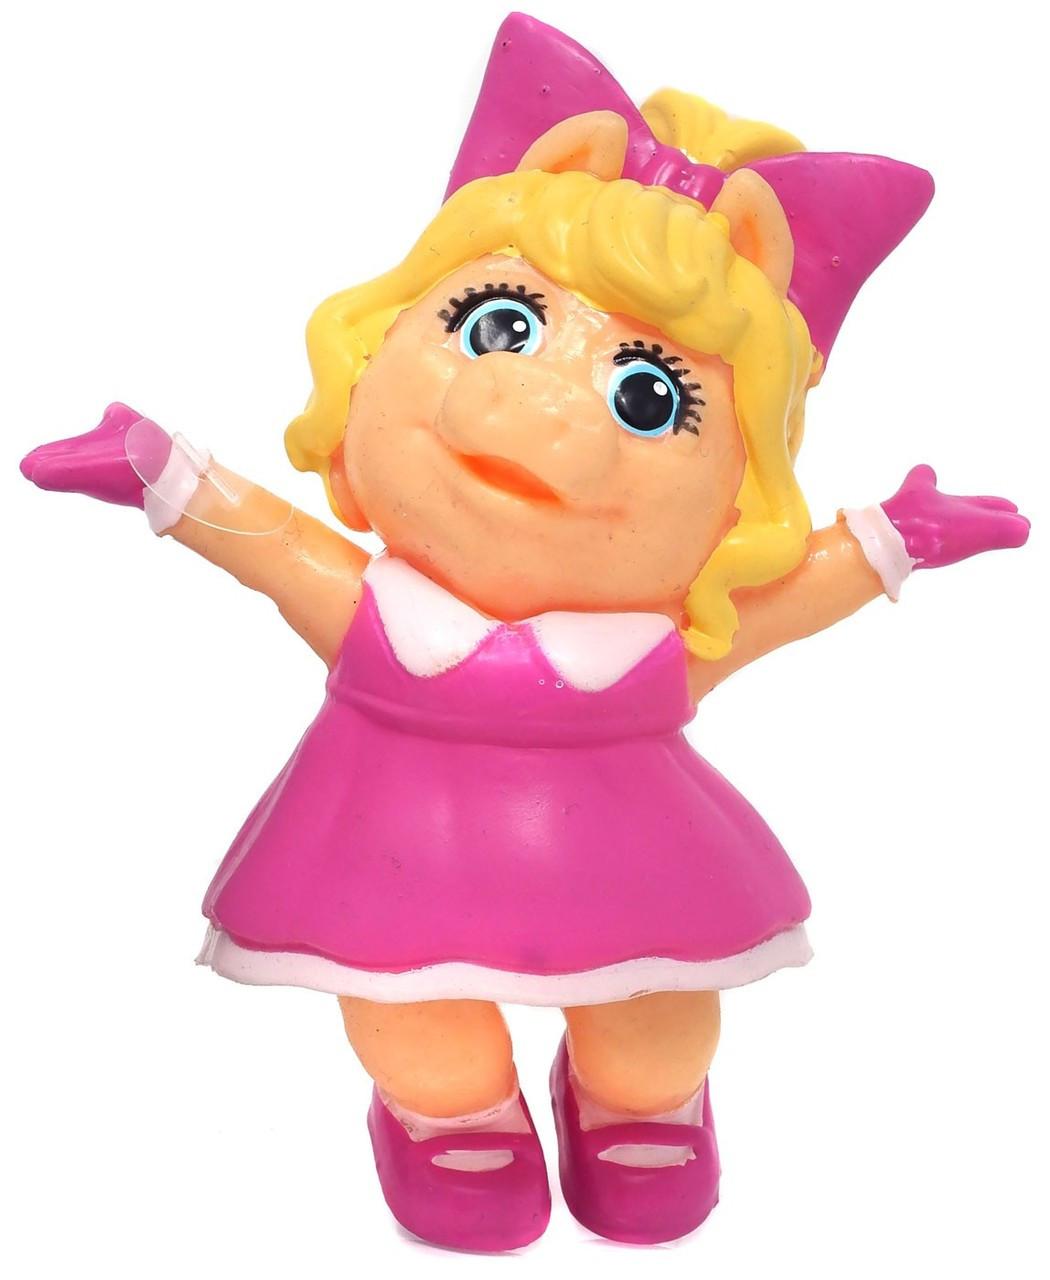 Disney Junior Muppet Babies Life-Like Piggy 3 5-Inch Rubber Figure